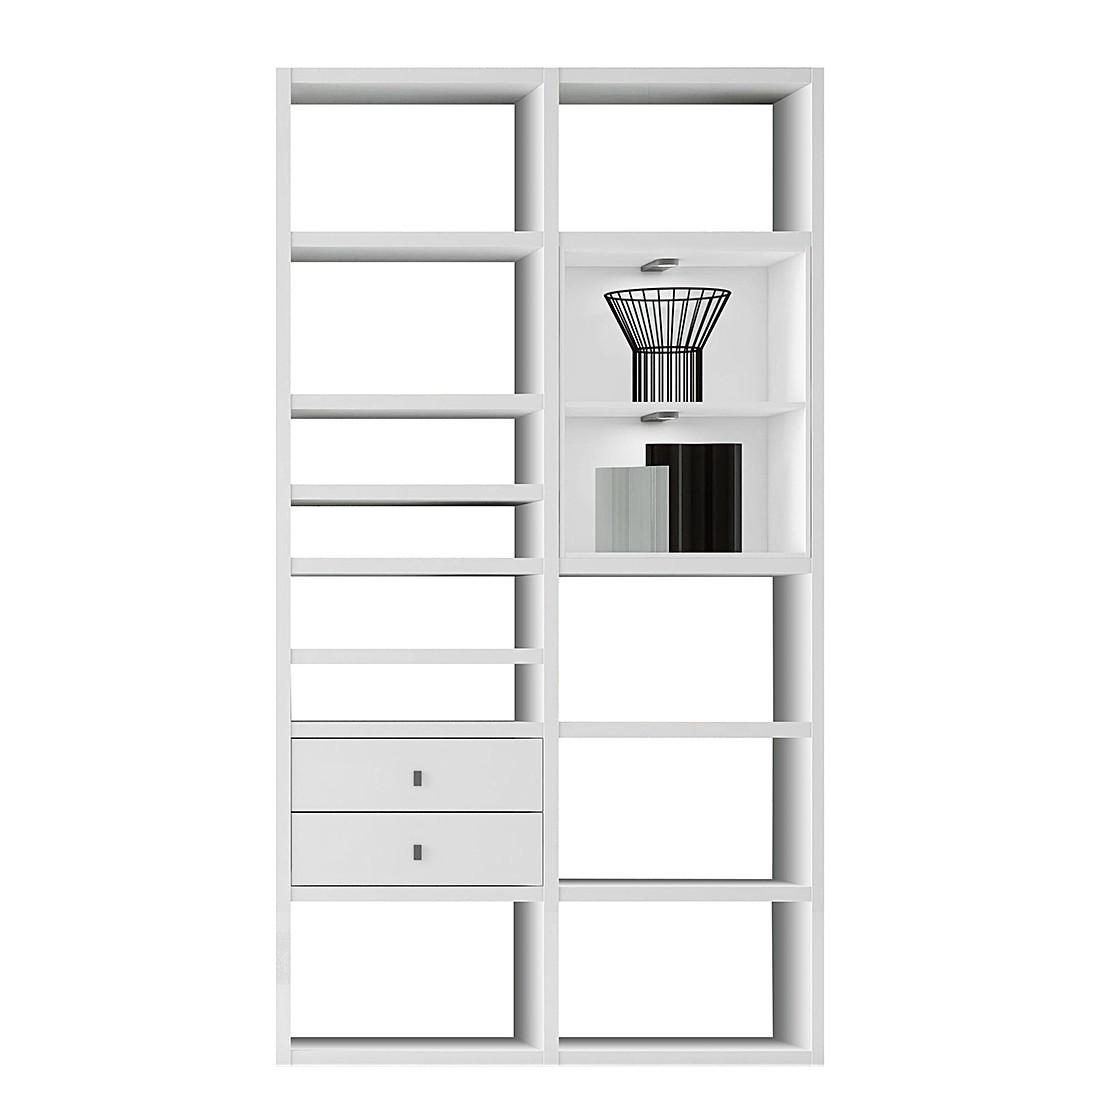 EEK A+, Regal Emporior II - RGB LED-Beleuchtung - Weiß, loftscape